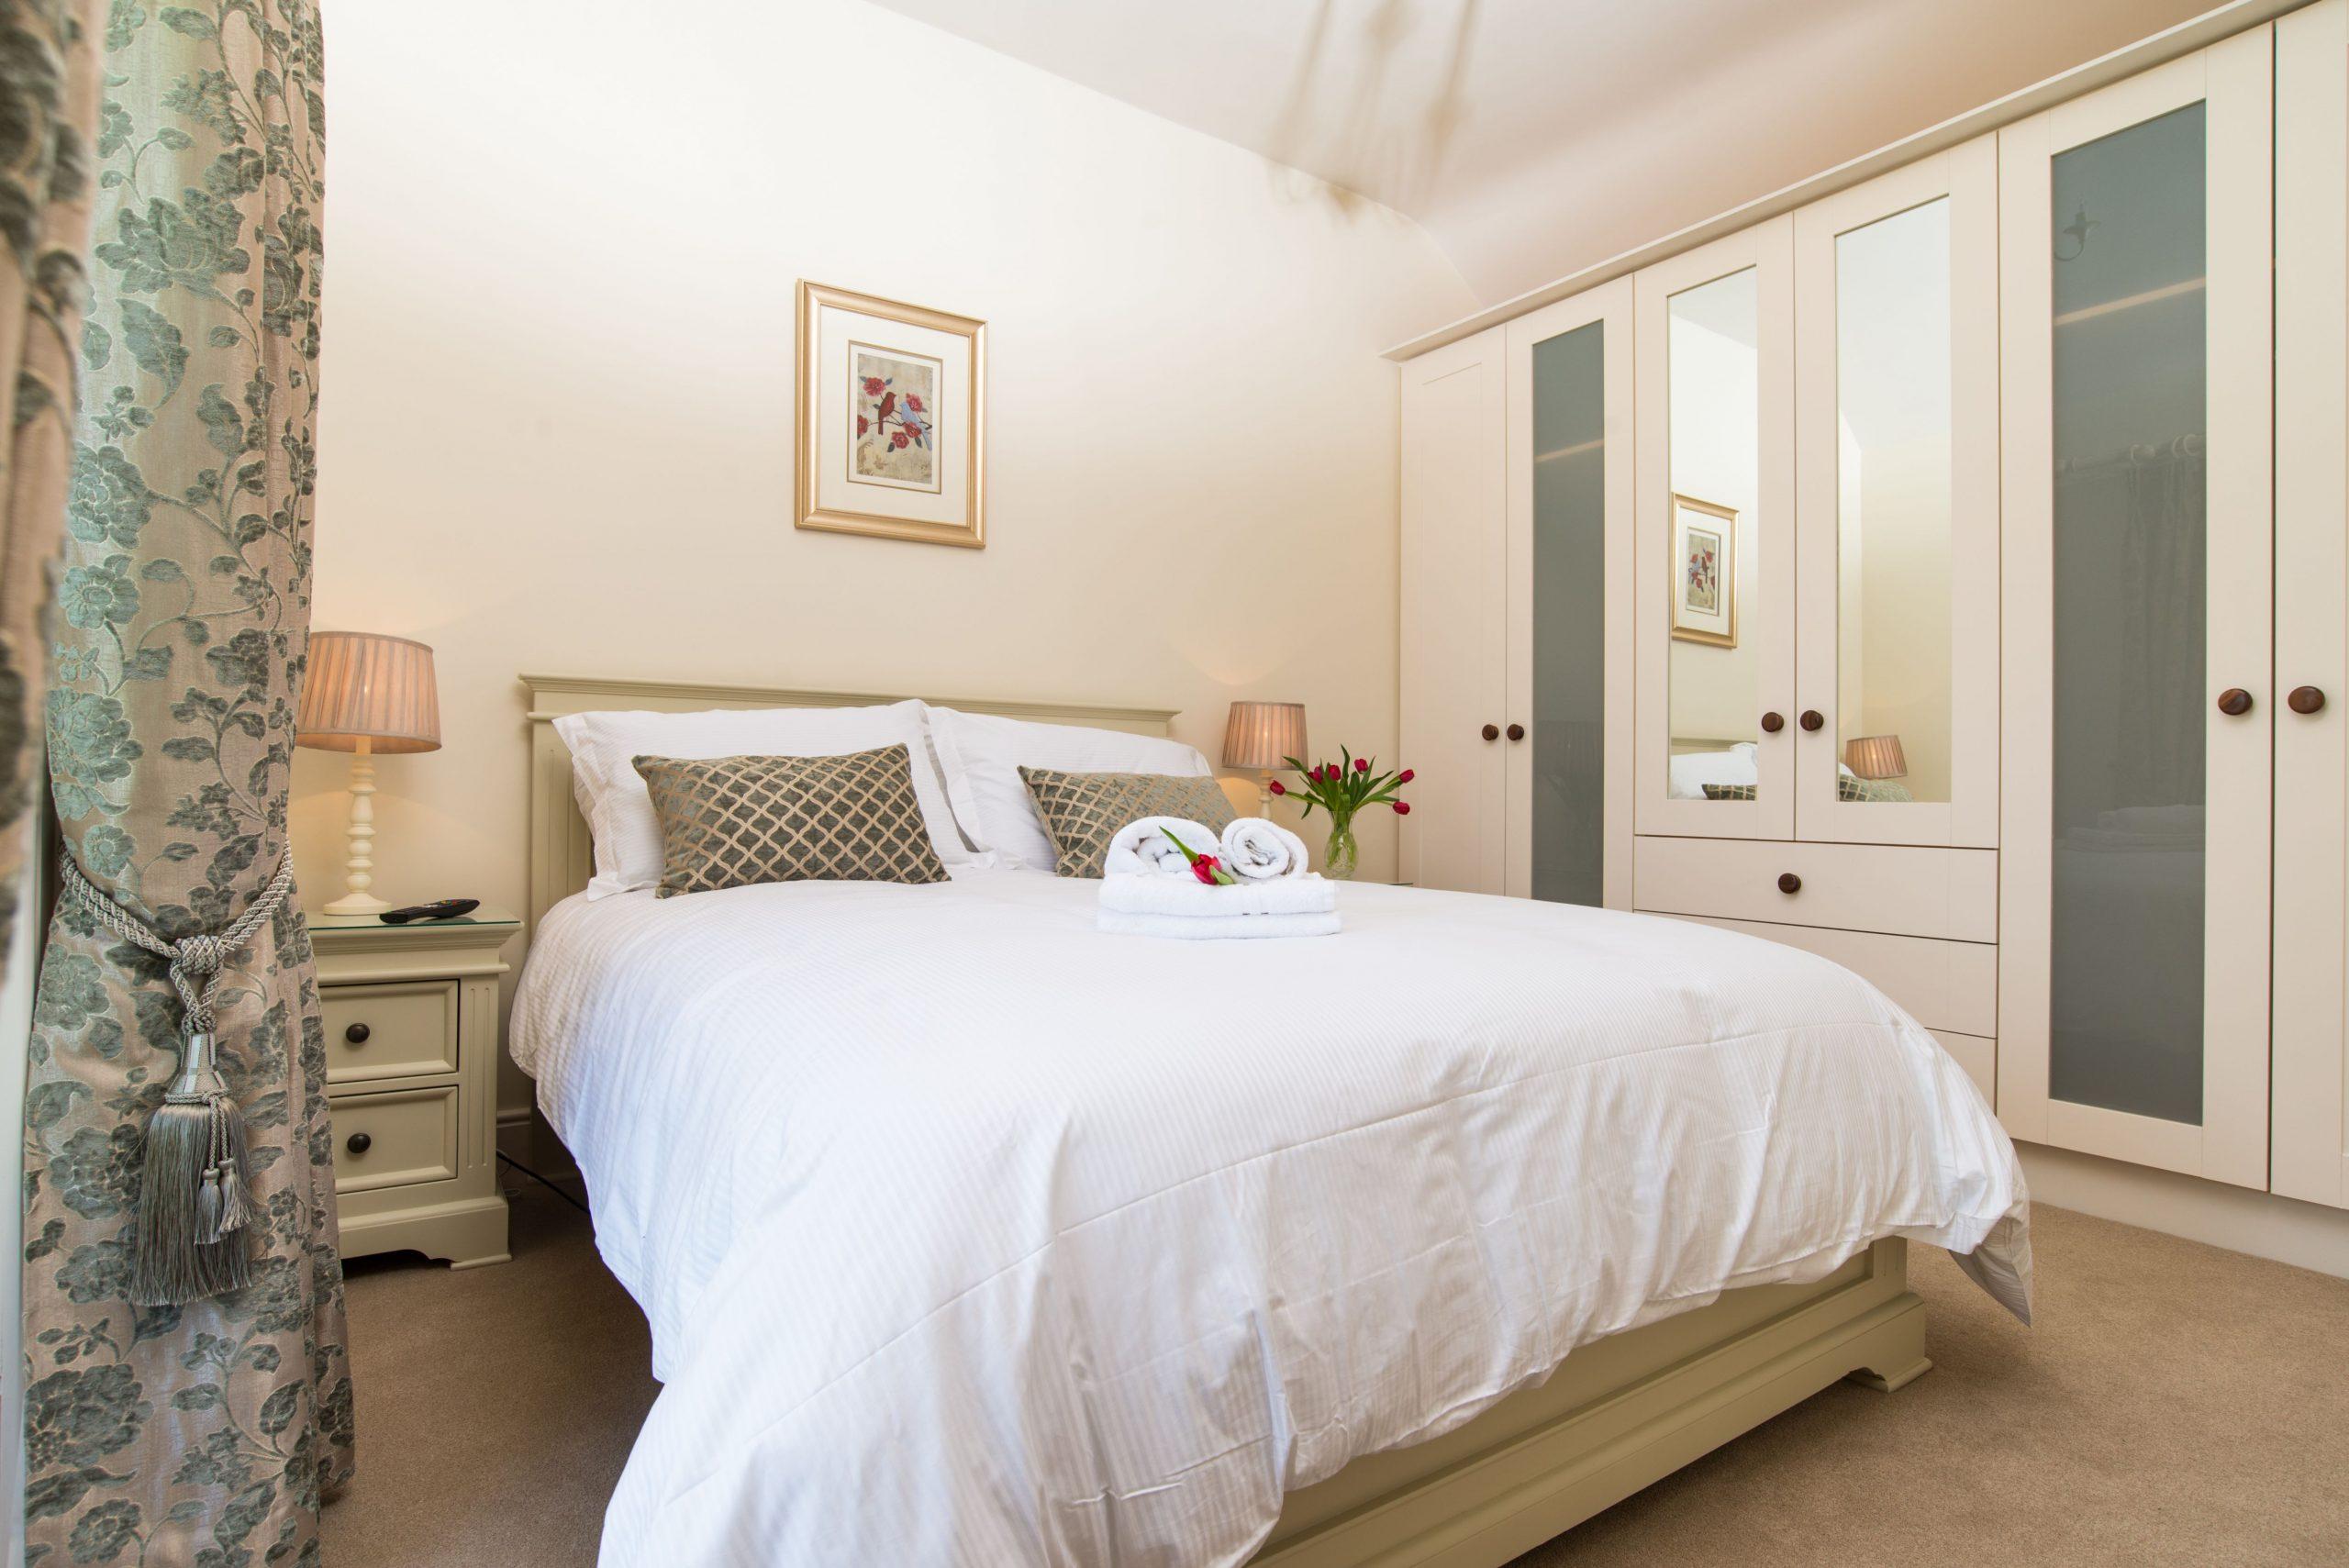 Bedroom at Abhainn Ri B&B, Photo 3